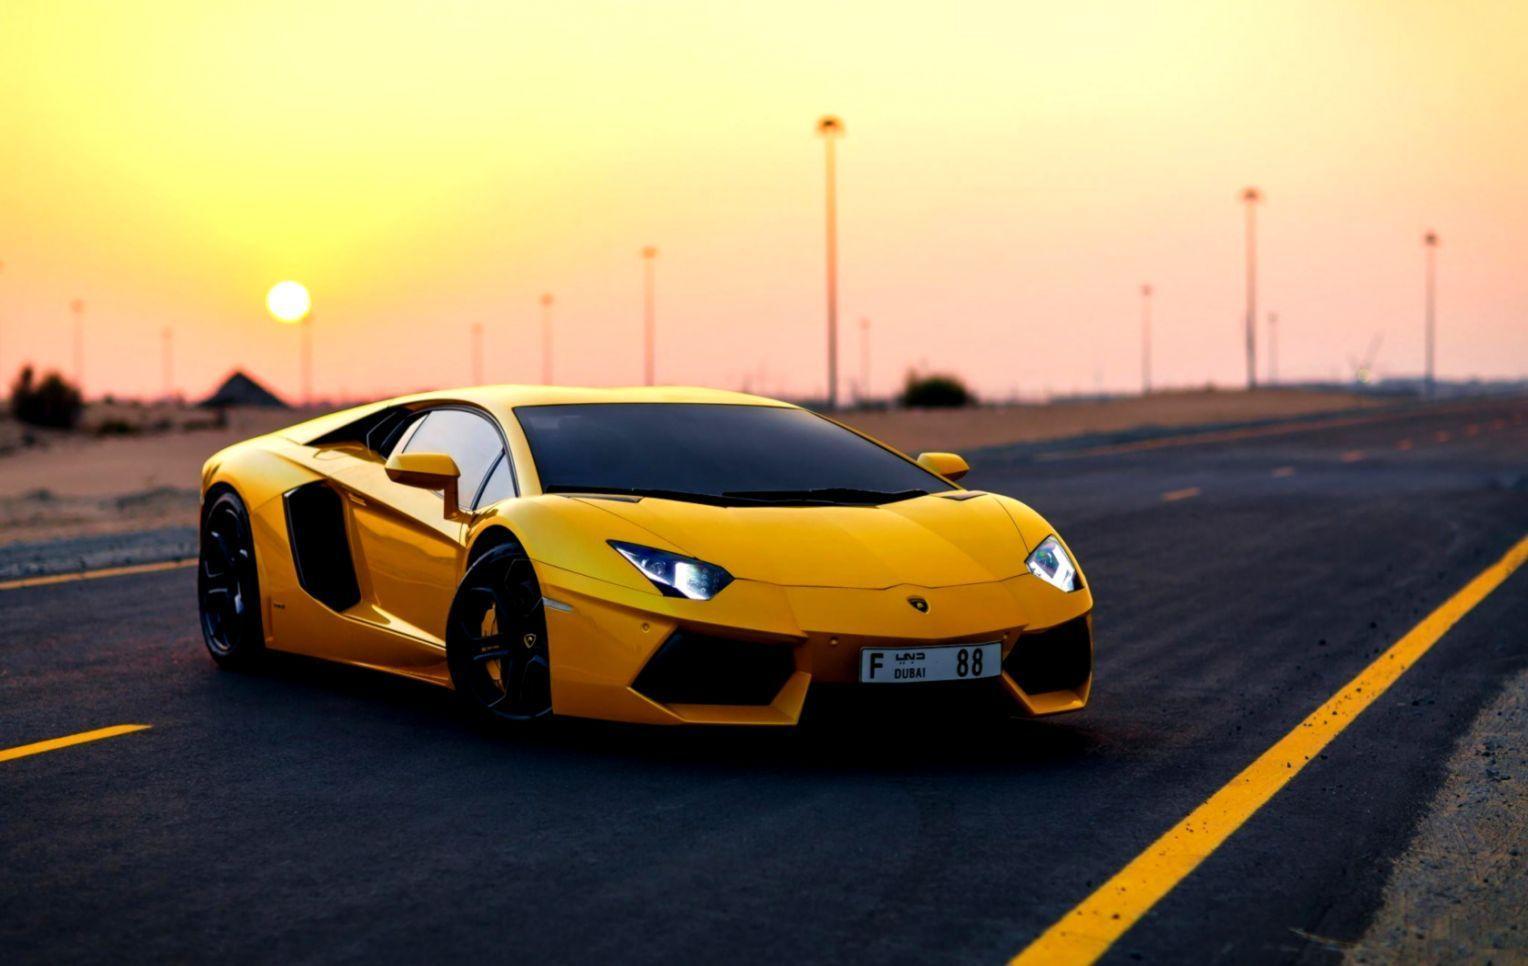 Yellow Car Hd Wallpapers Top Free Yellow Car Hd Backgrounds Wallpaperaccess